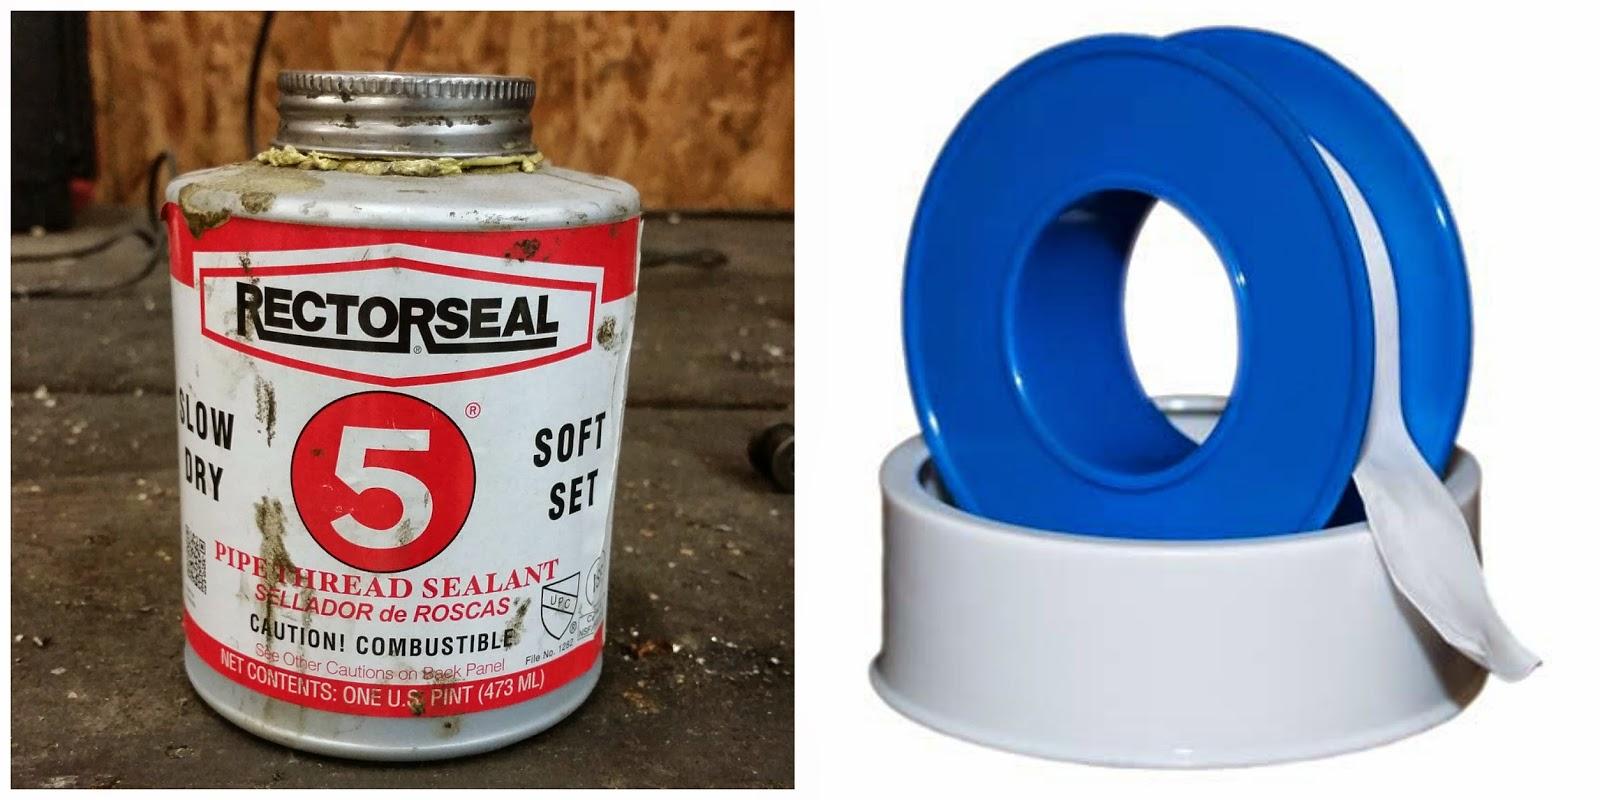 The pigeasy files pipe thread sealant vs teflon tape